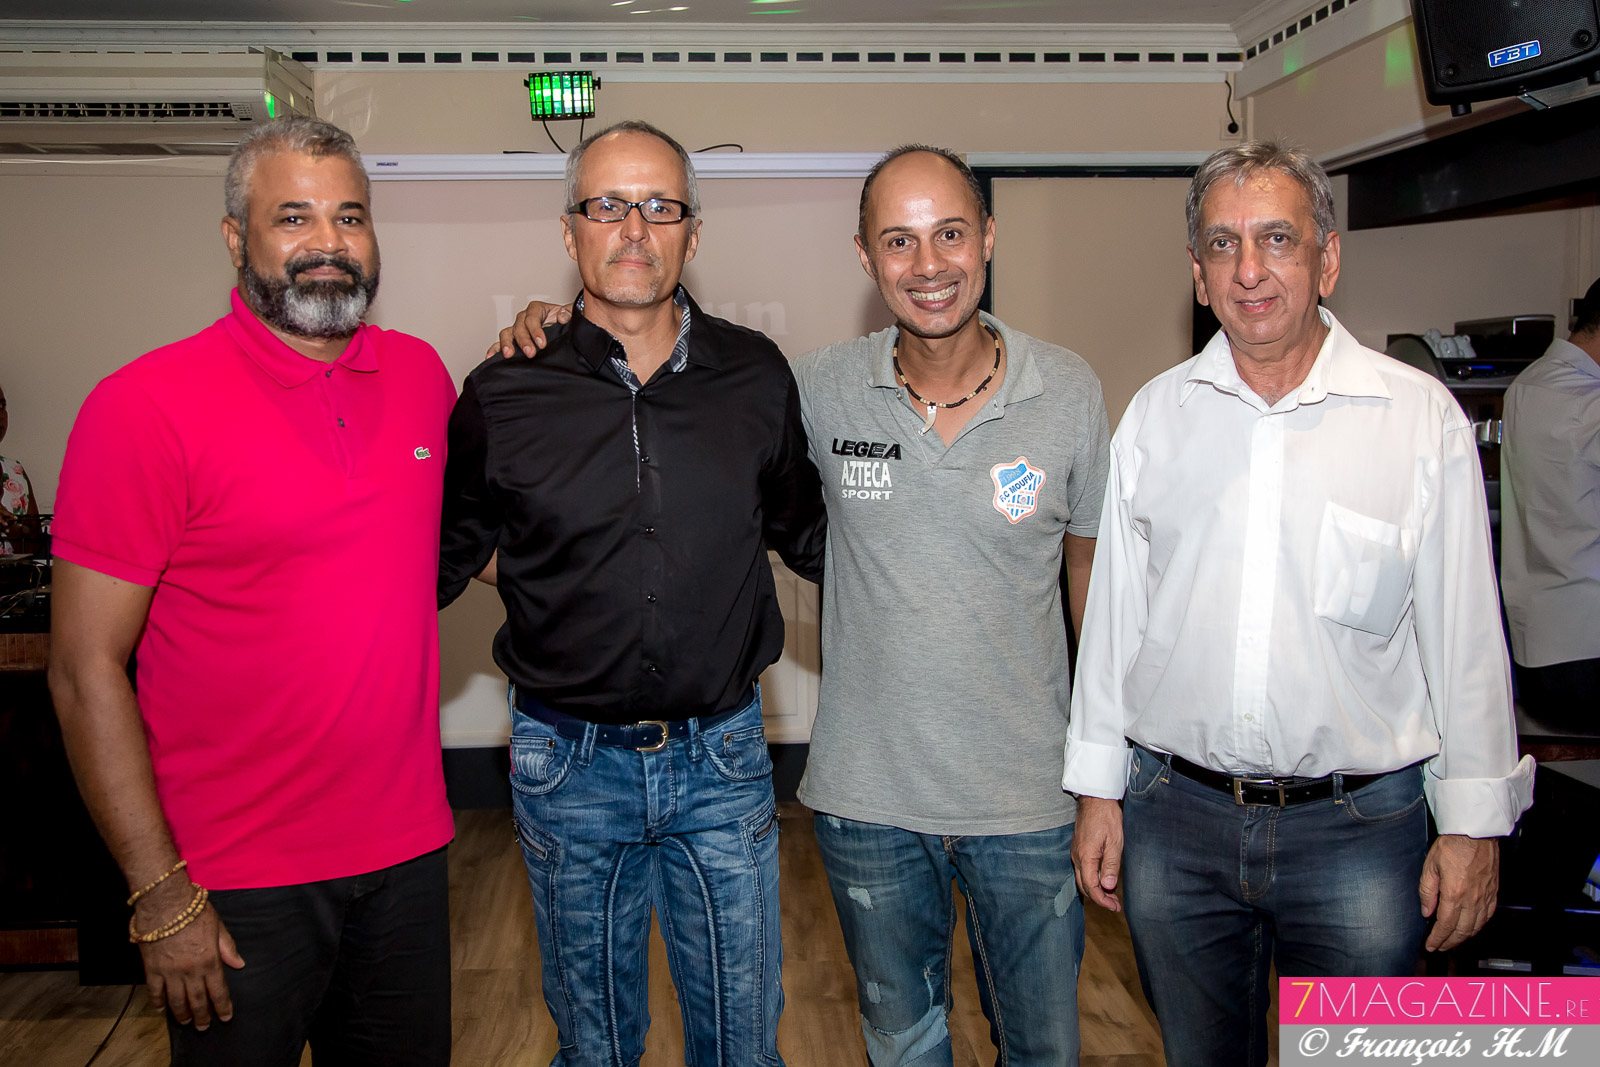 Freddy Latchoumaya, Patrick Grondin, Pascal Falcuci, et Aziz Patel